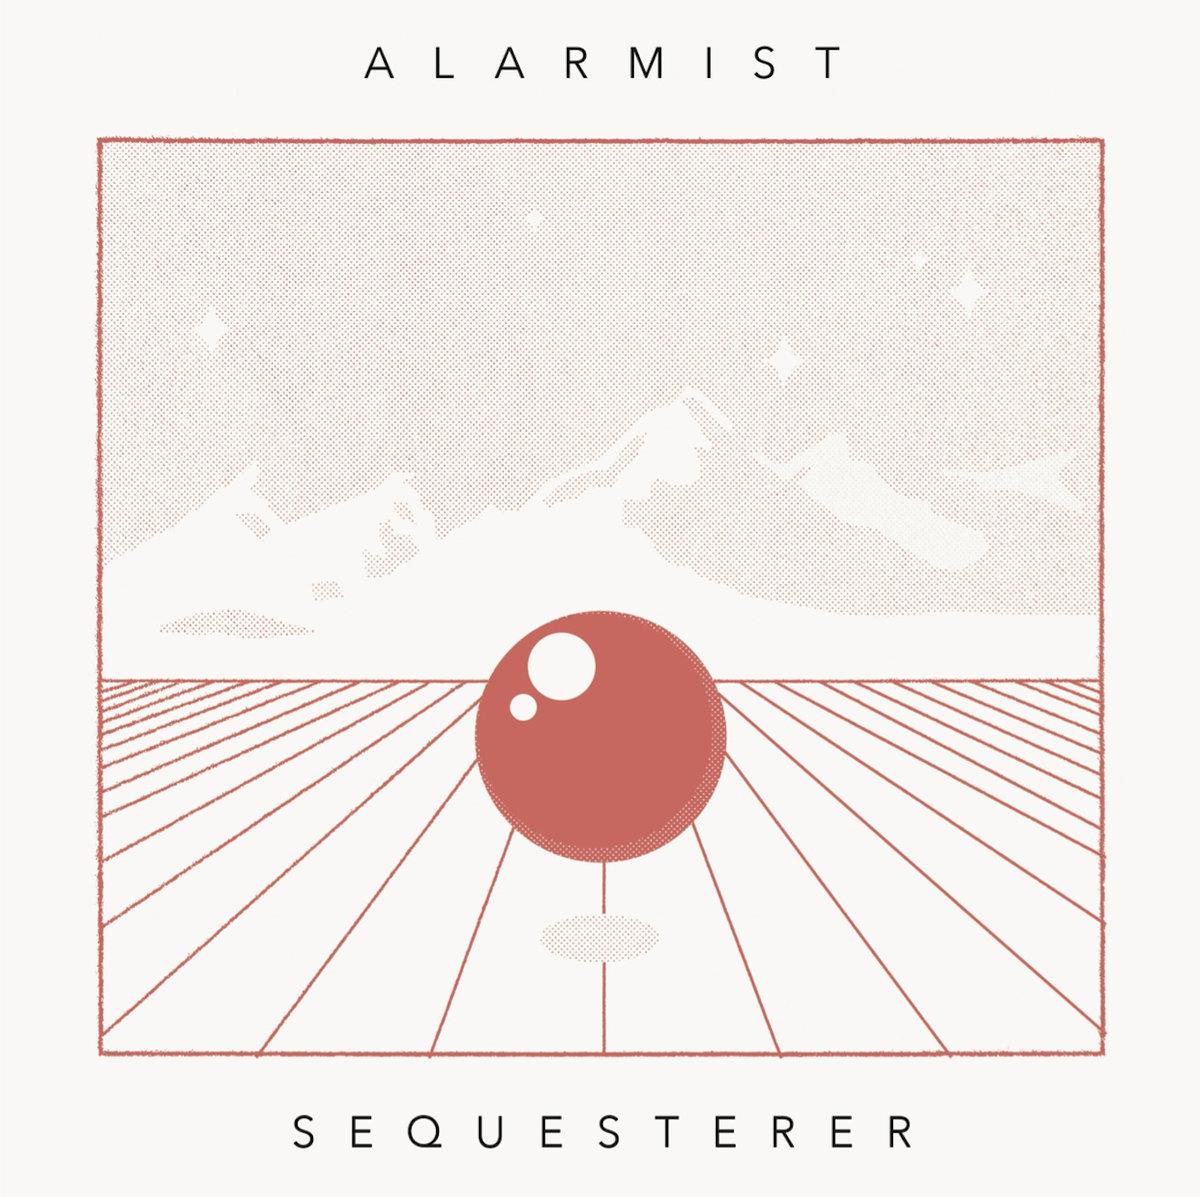 Alarmist - Seaquesterer